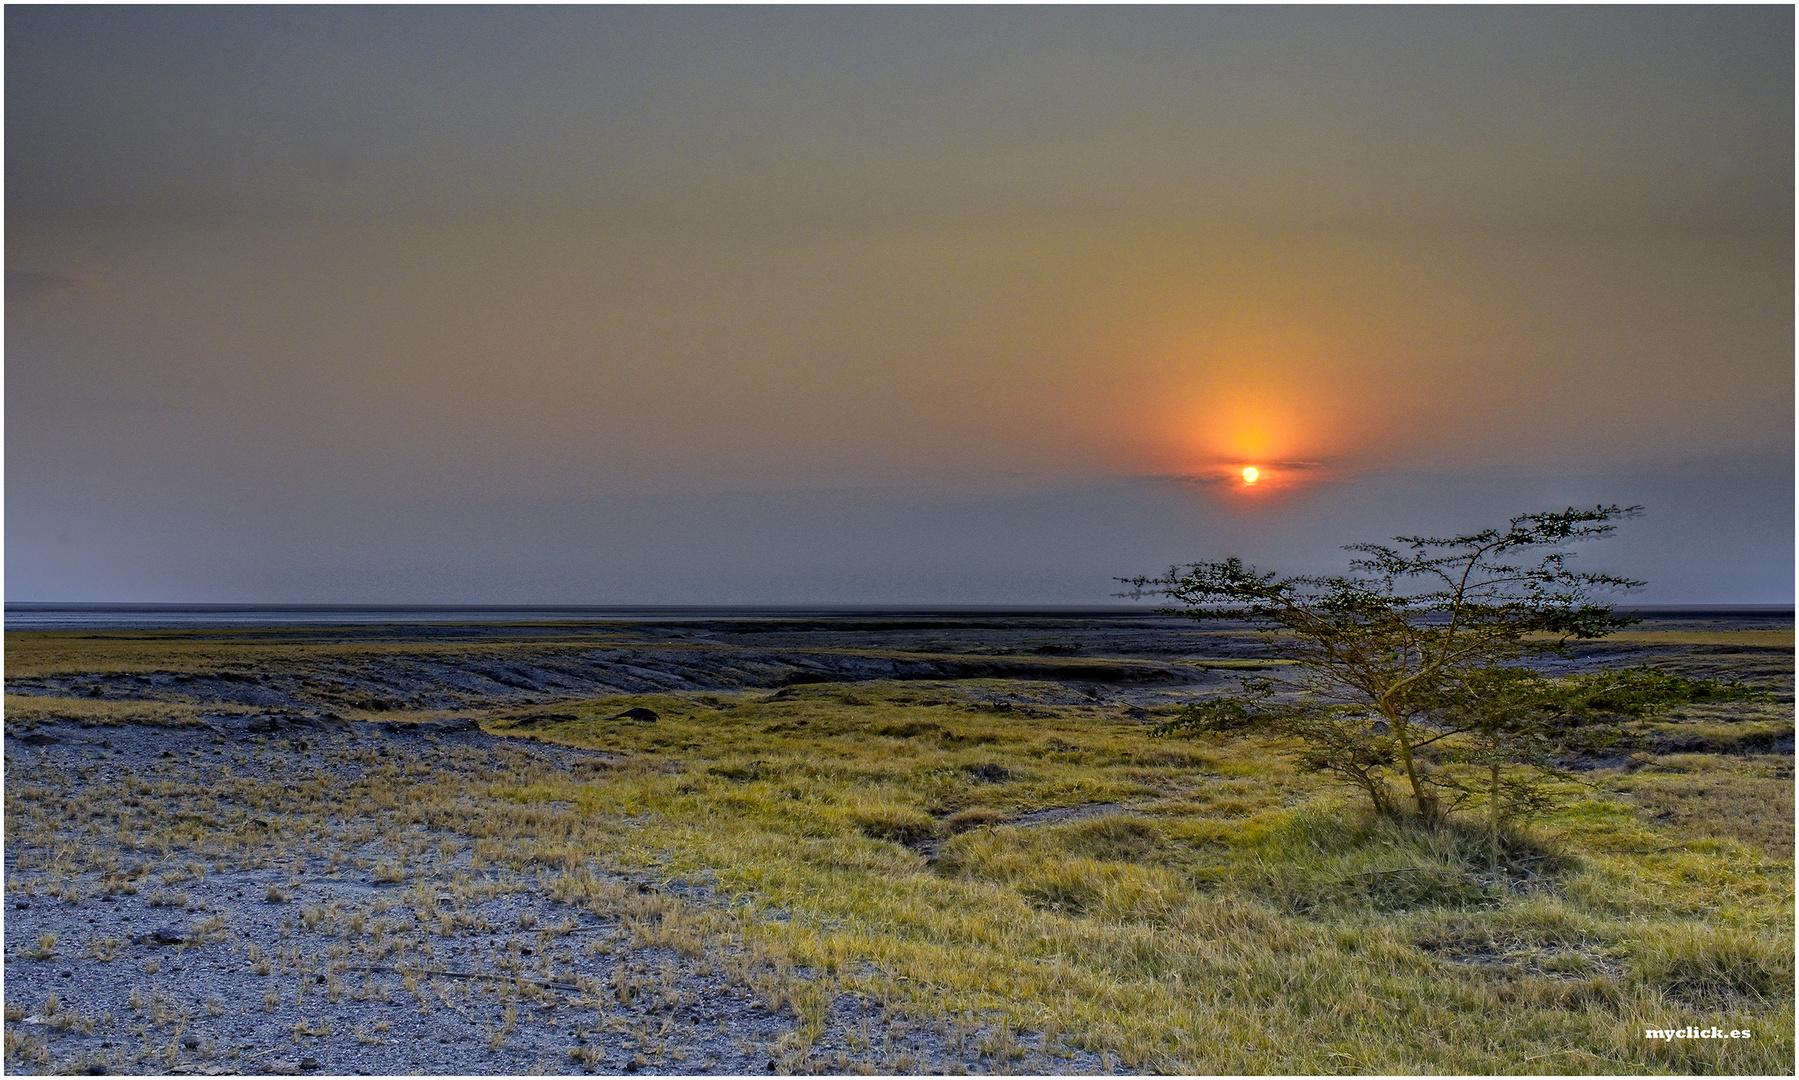 MEMORIAS DE AFRICA -ATARDECER EN EL LAGO EYASY -TANZANIA